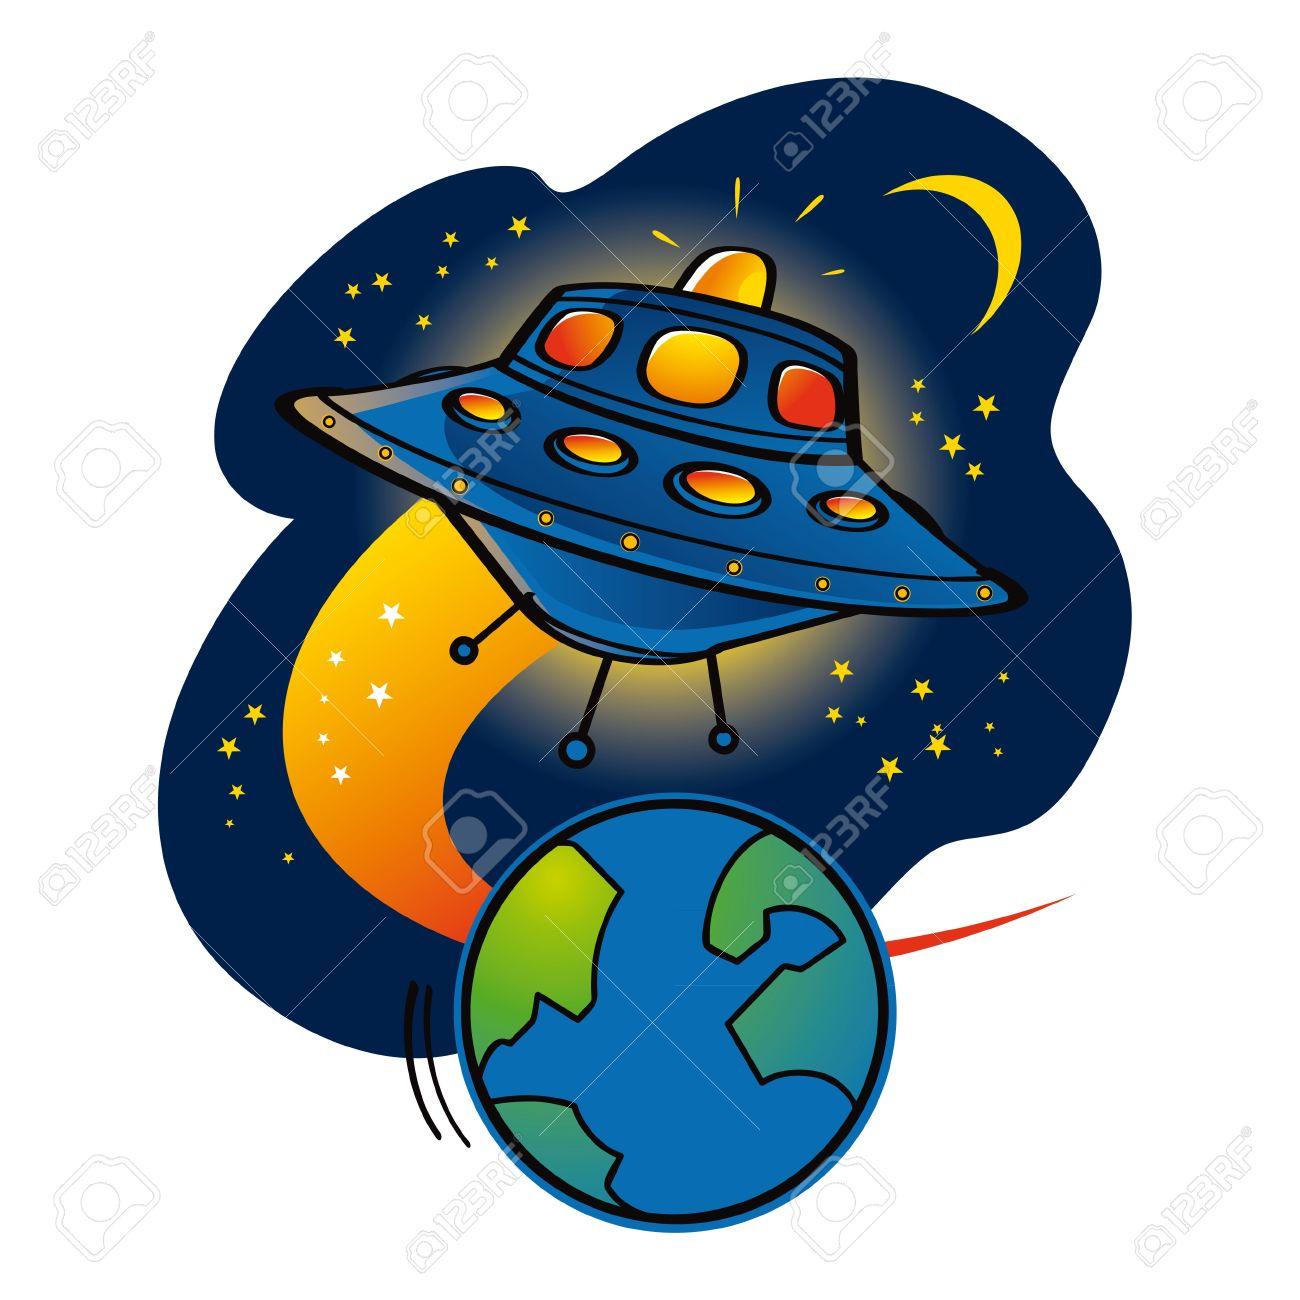 1300x1300 Galactic Astronaut Clipart, Explore Pictures